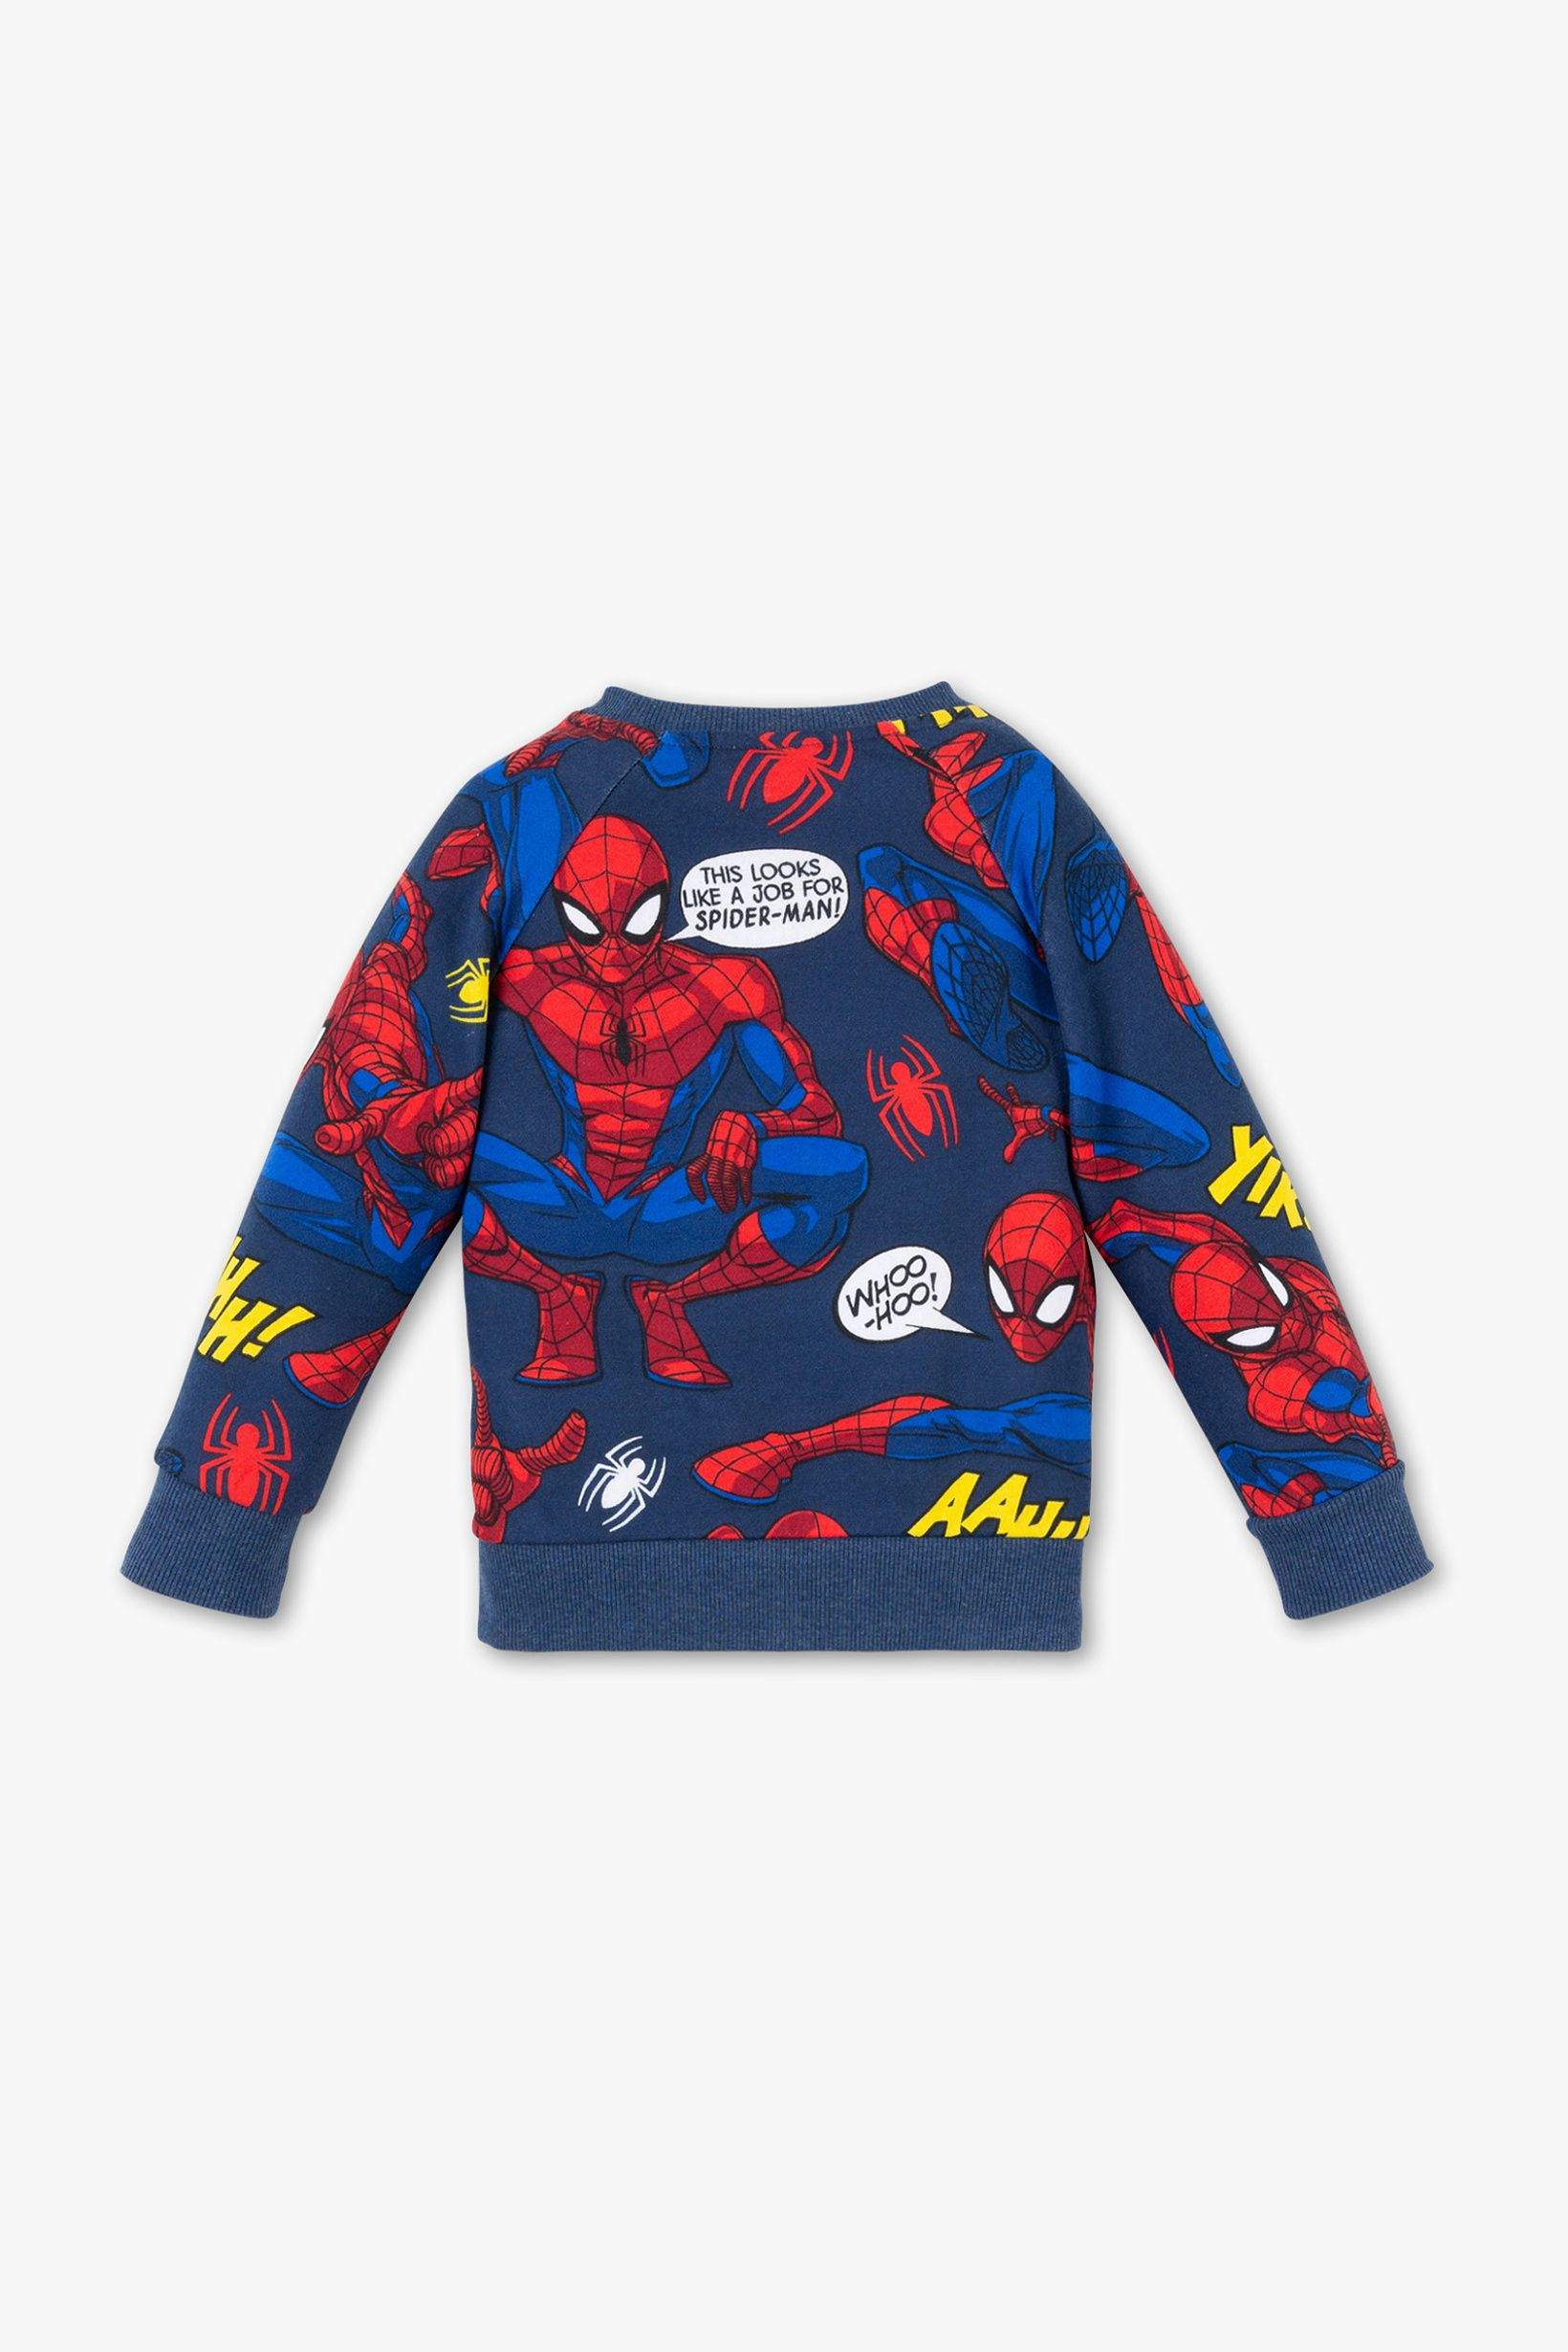 ac7415615fb2 spider-man #marvel #disney #disneykids #C&A #kidsfashion #marvelkids ...